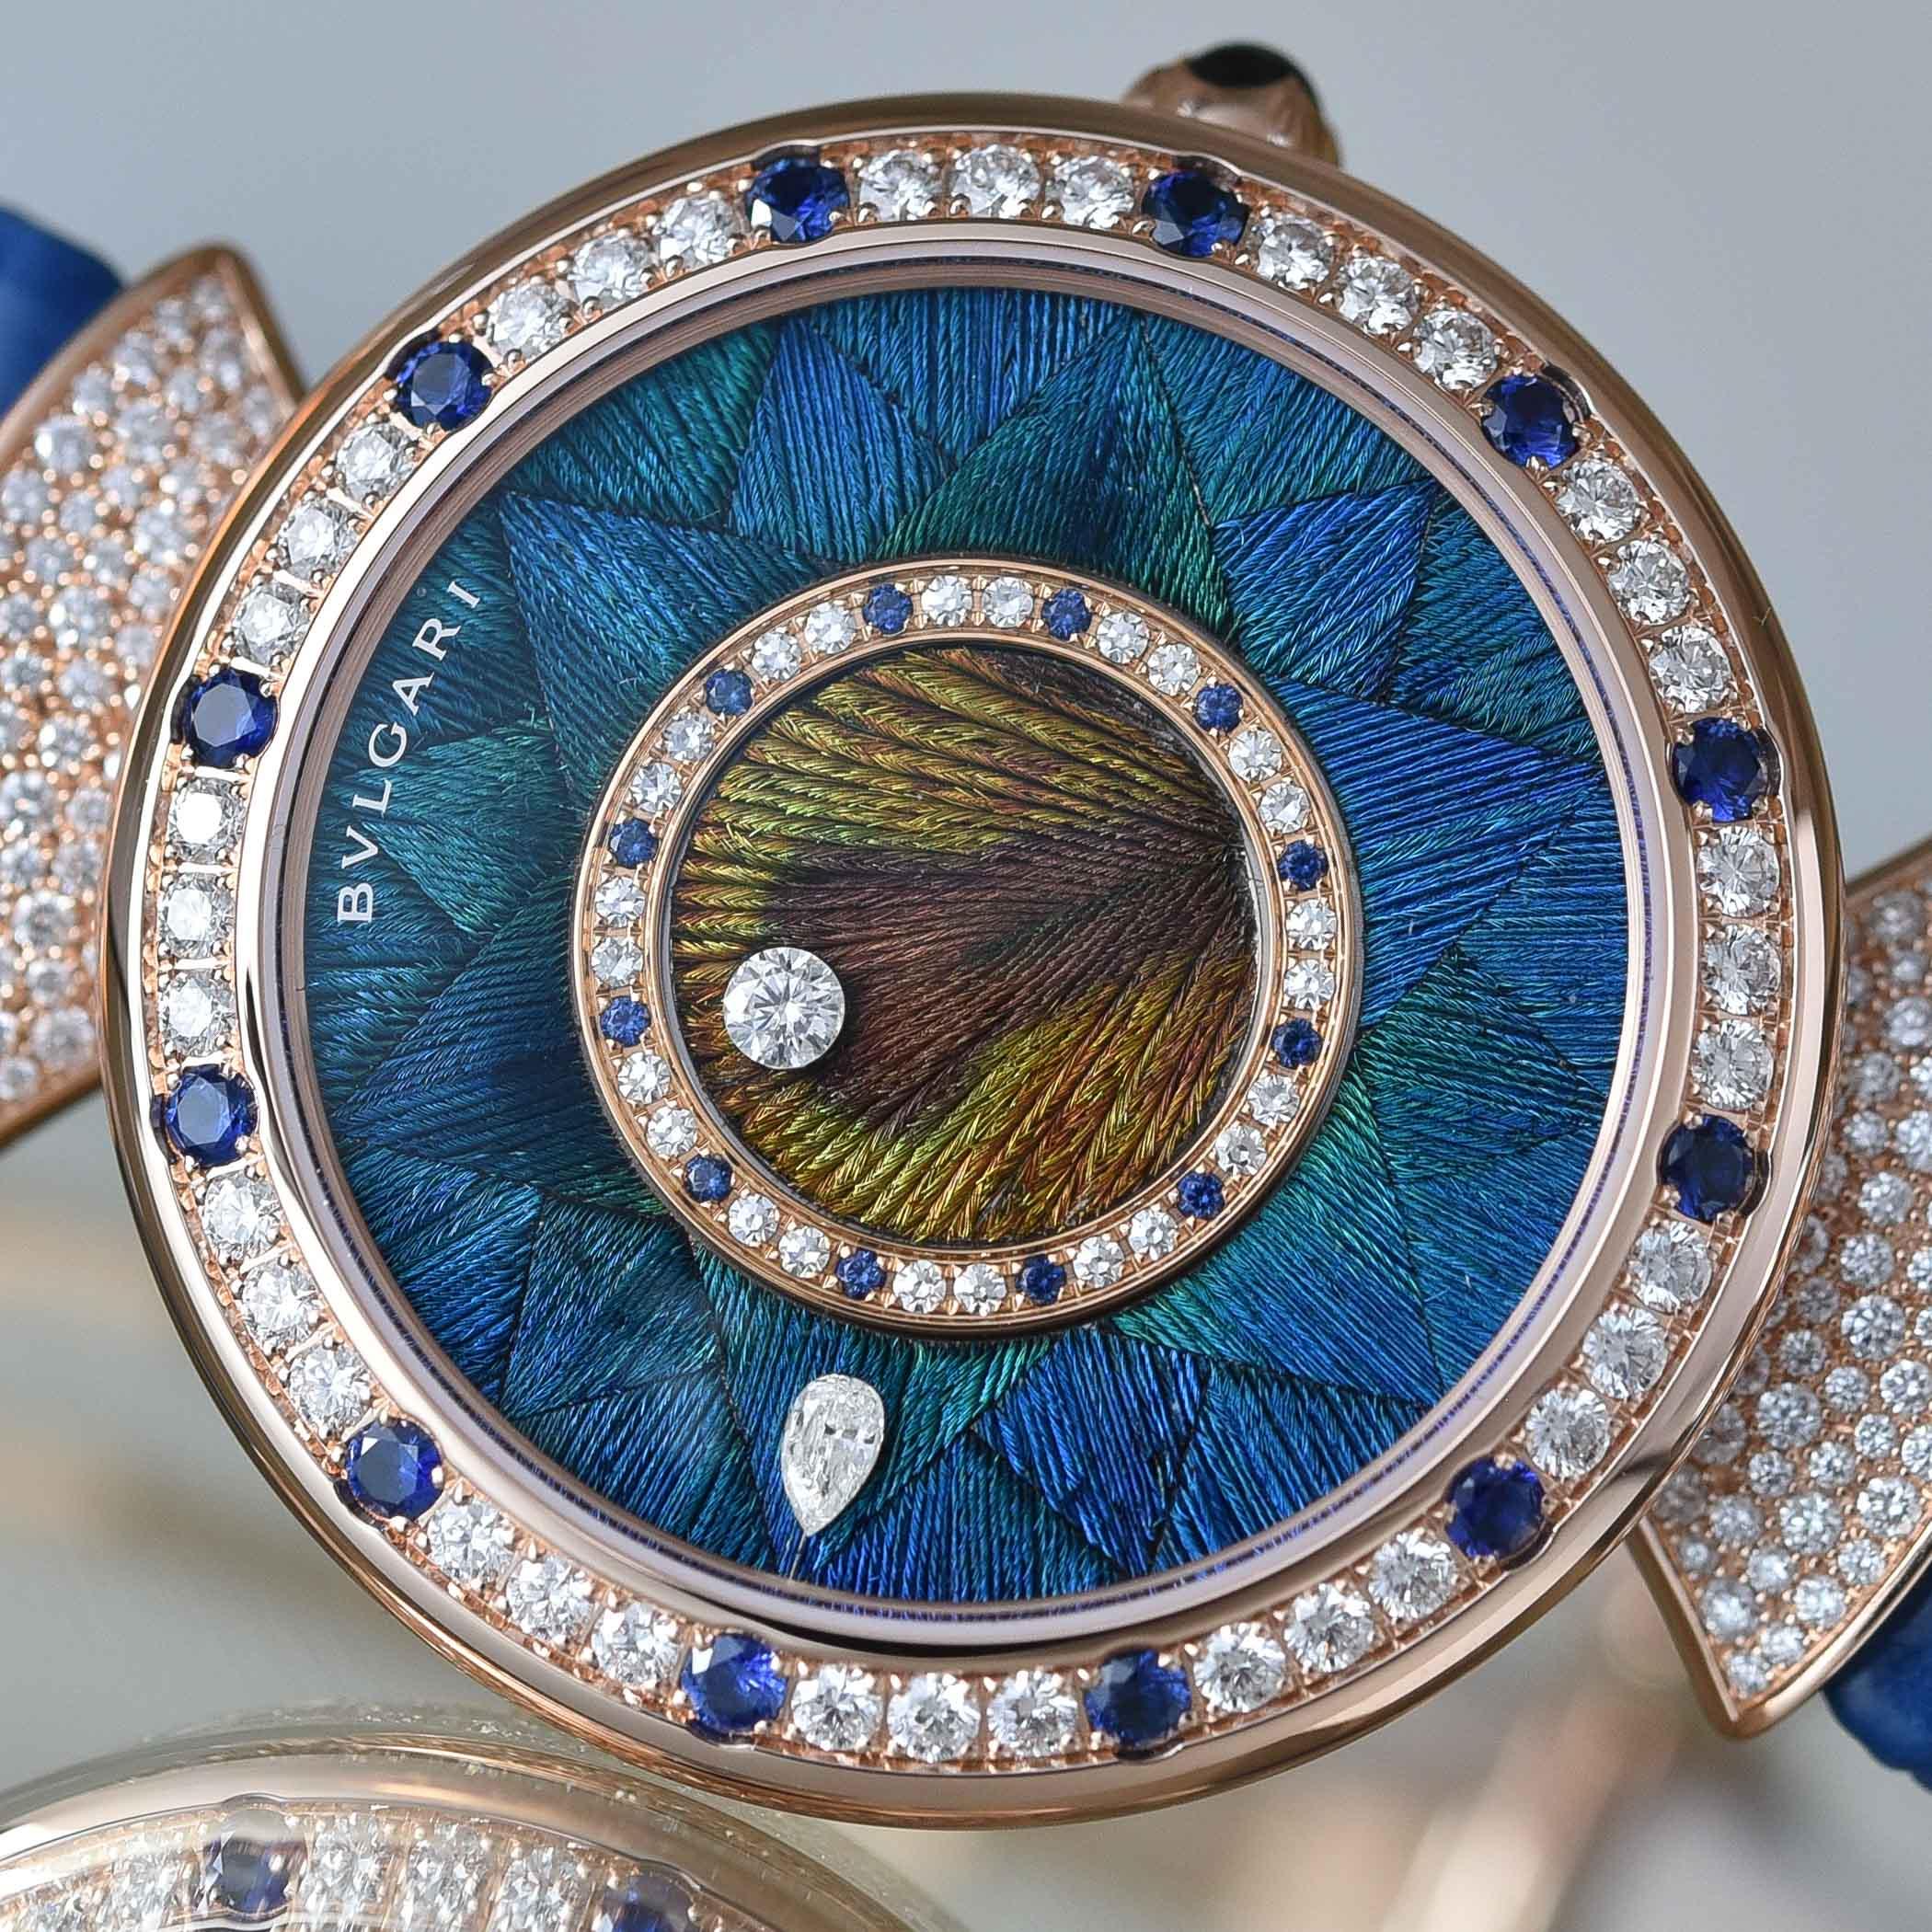 Hands-On - Bvlgari Divas' Dream Peacock Collection